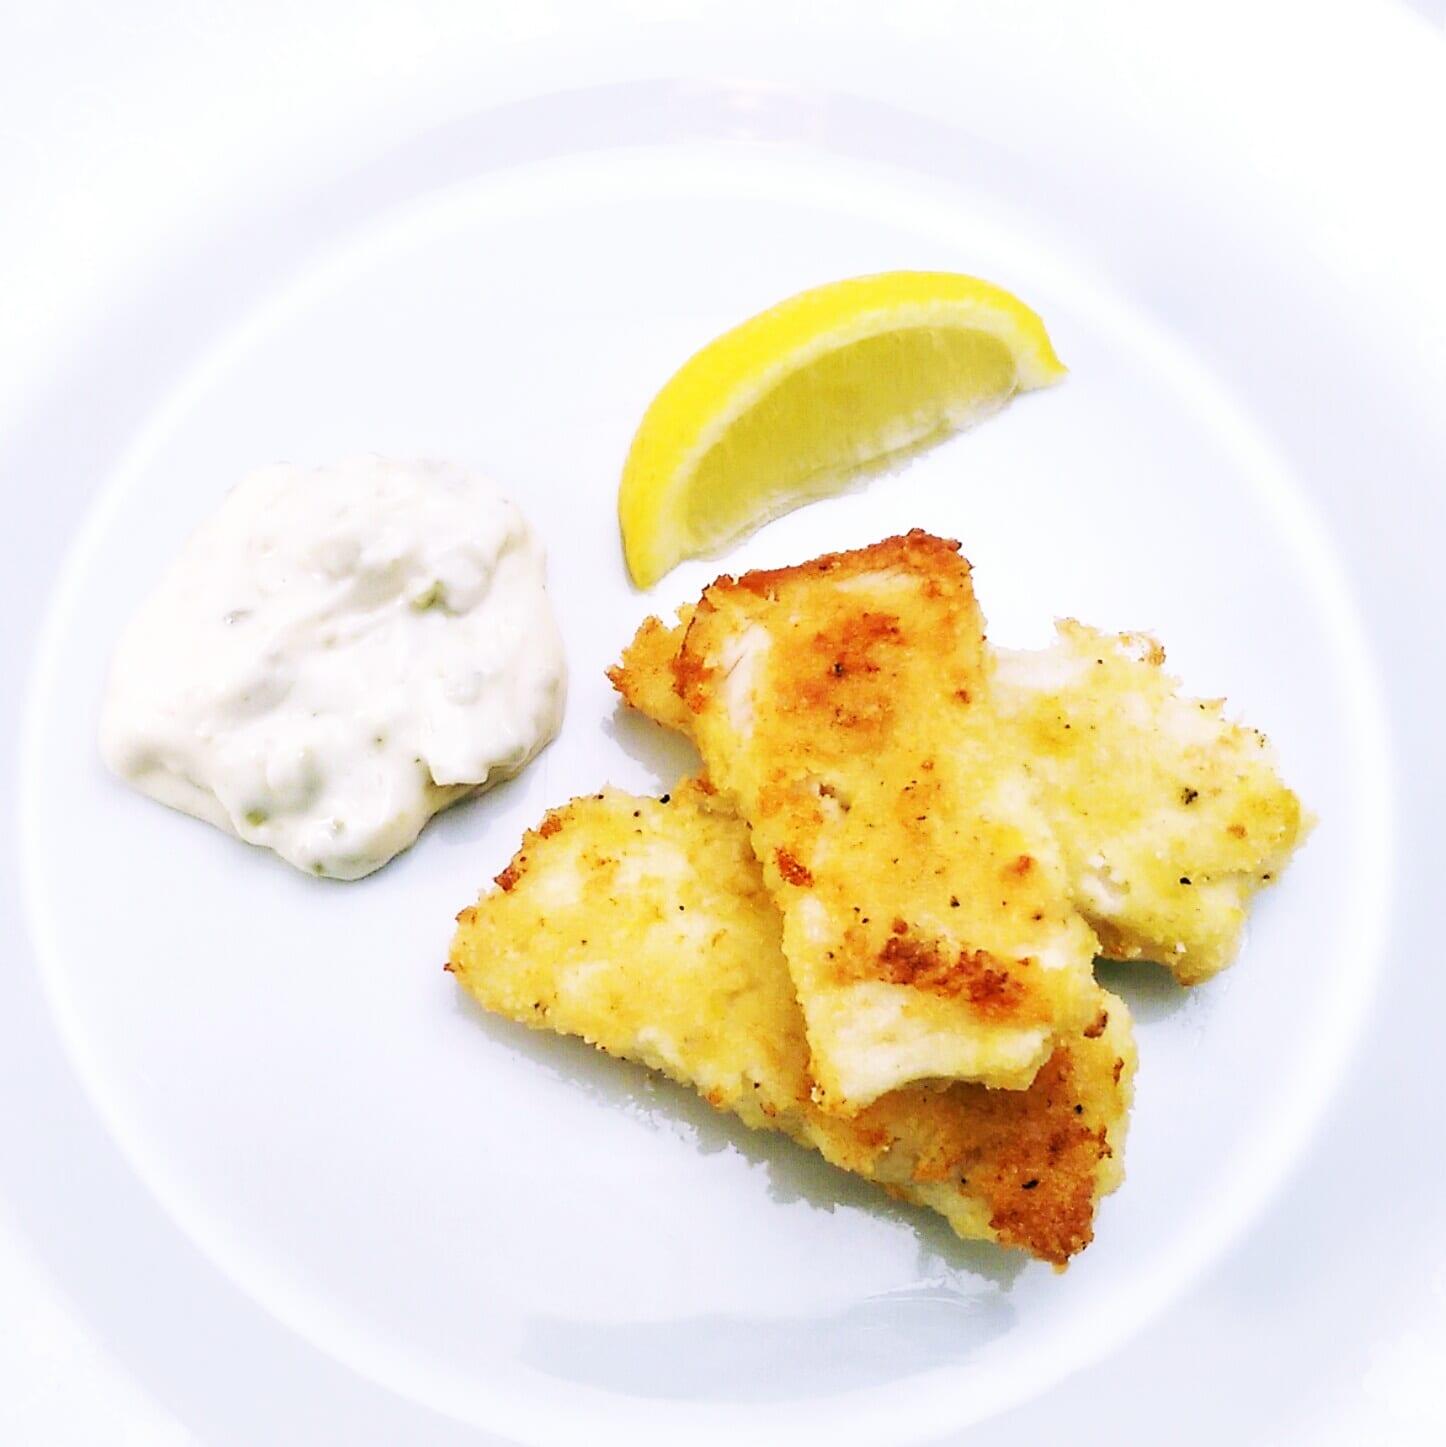 Lemon crumbed fish